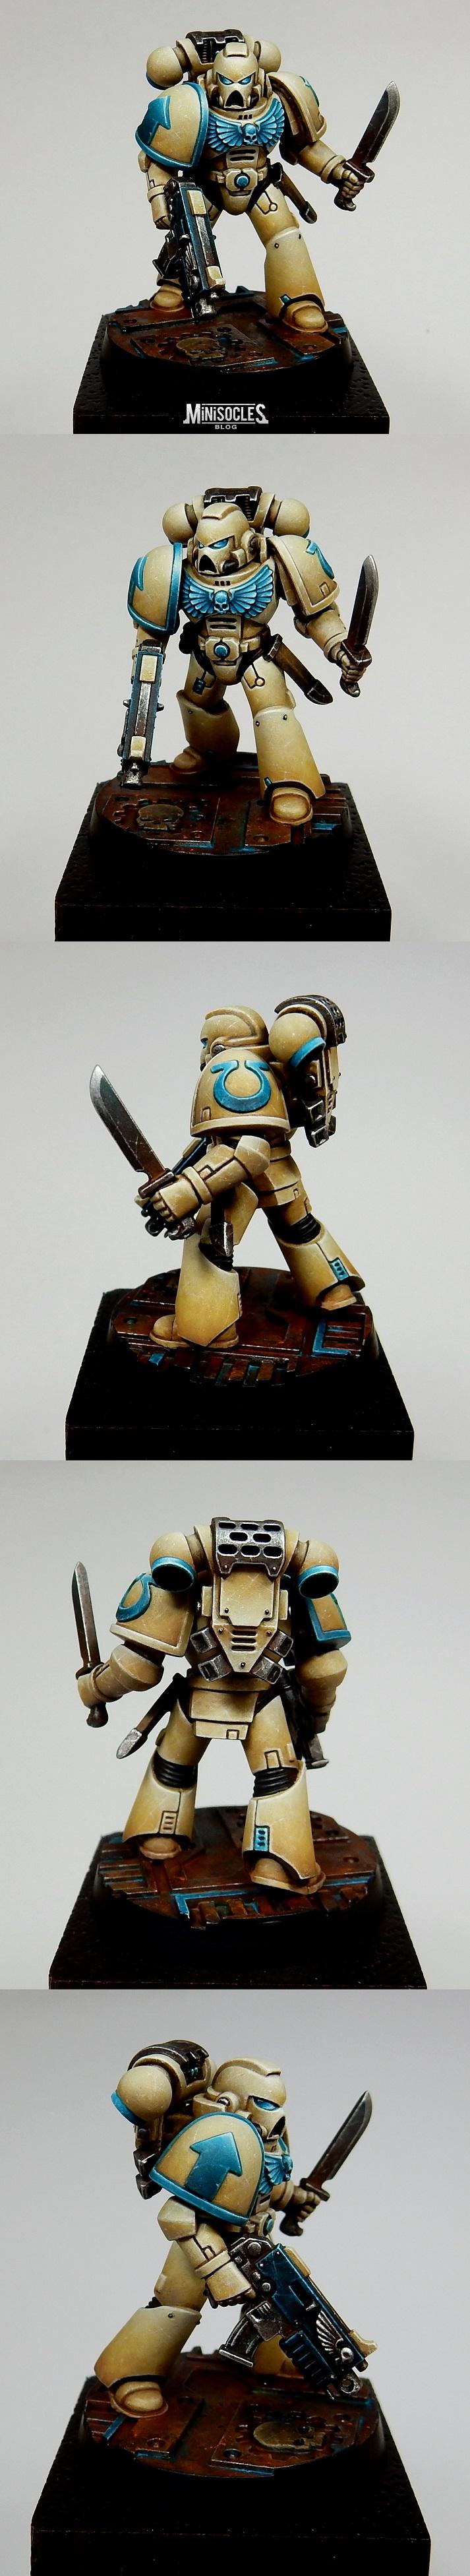 The creamy Space Marine